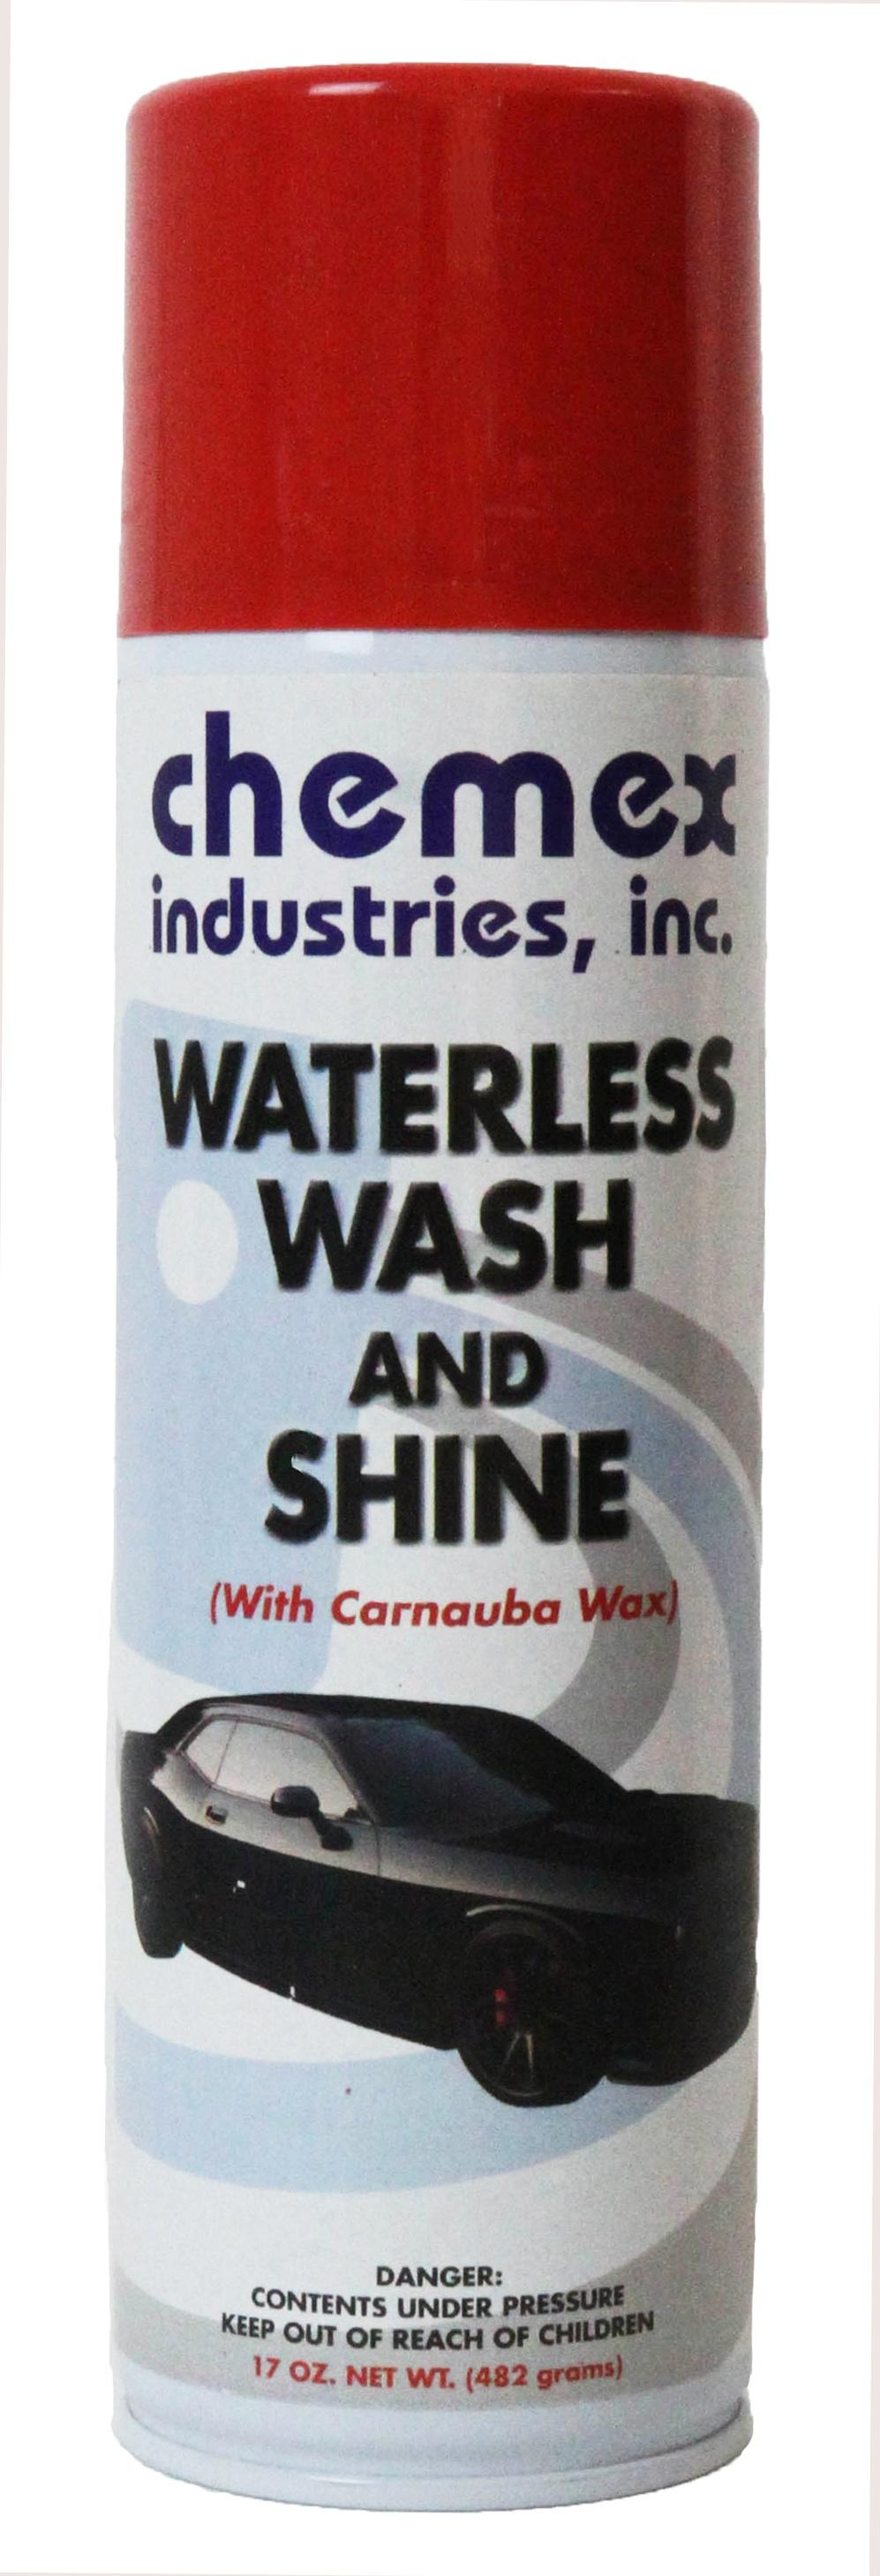 Waterless Wash and Shine_FA_CROPPED